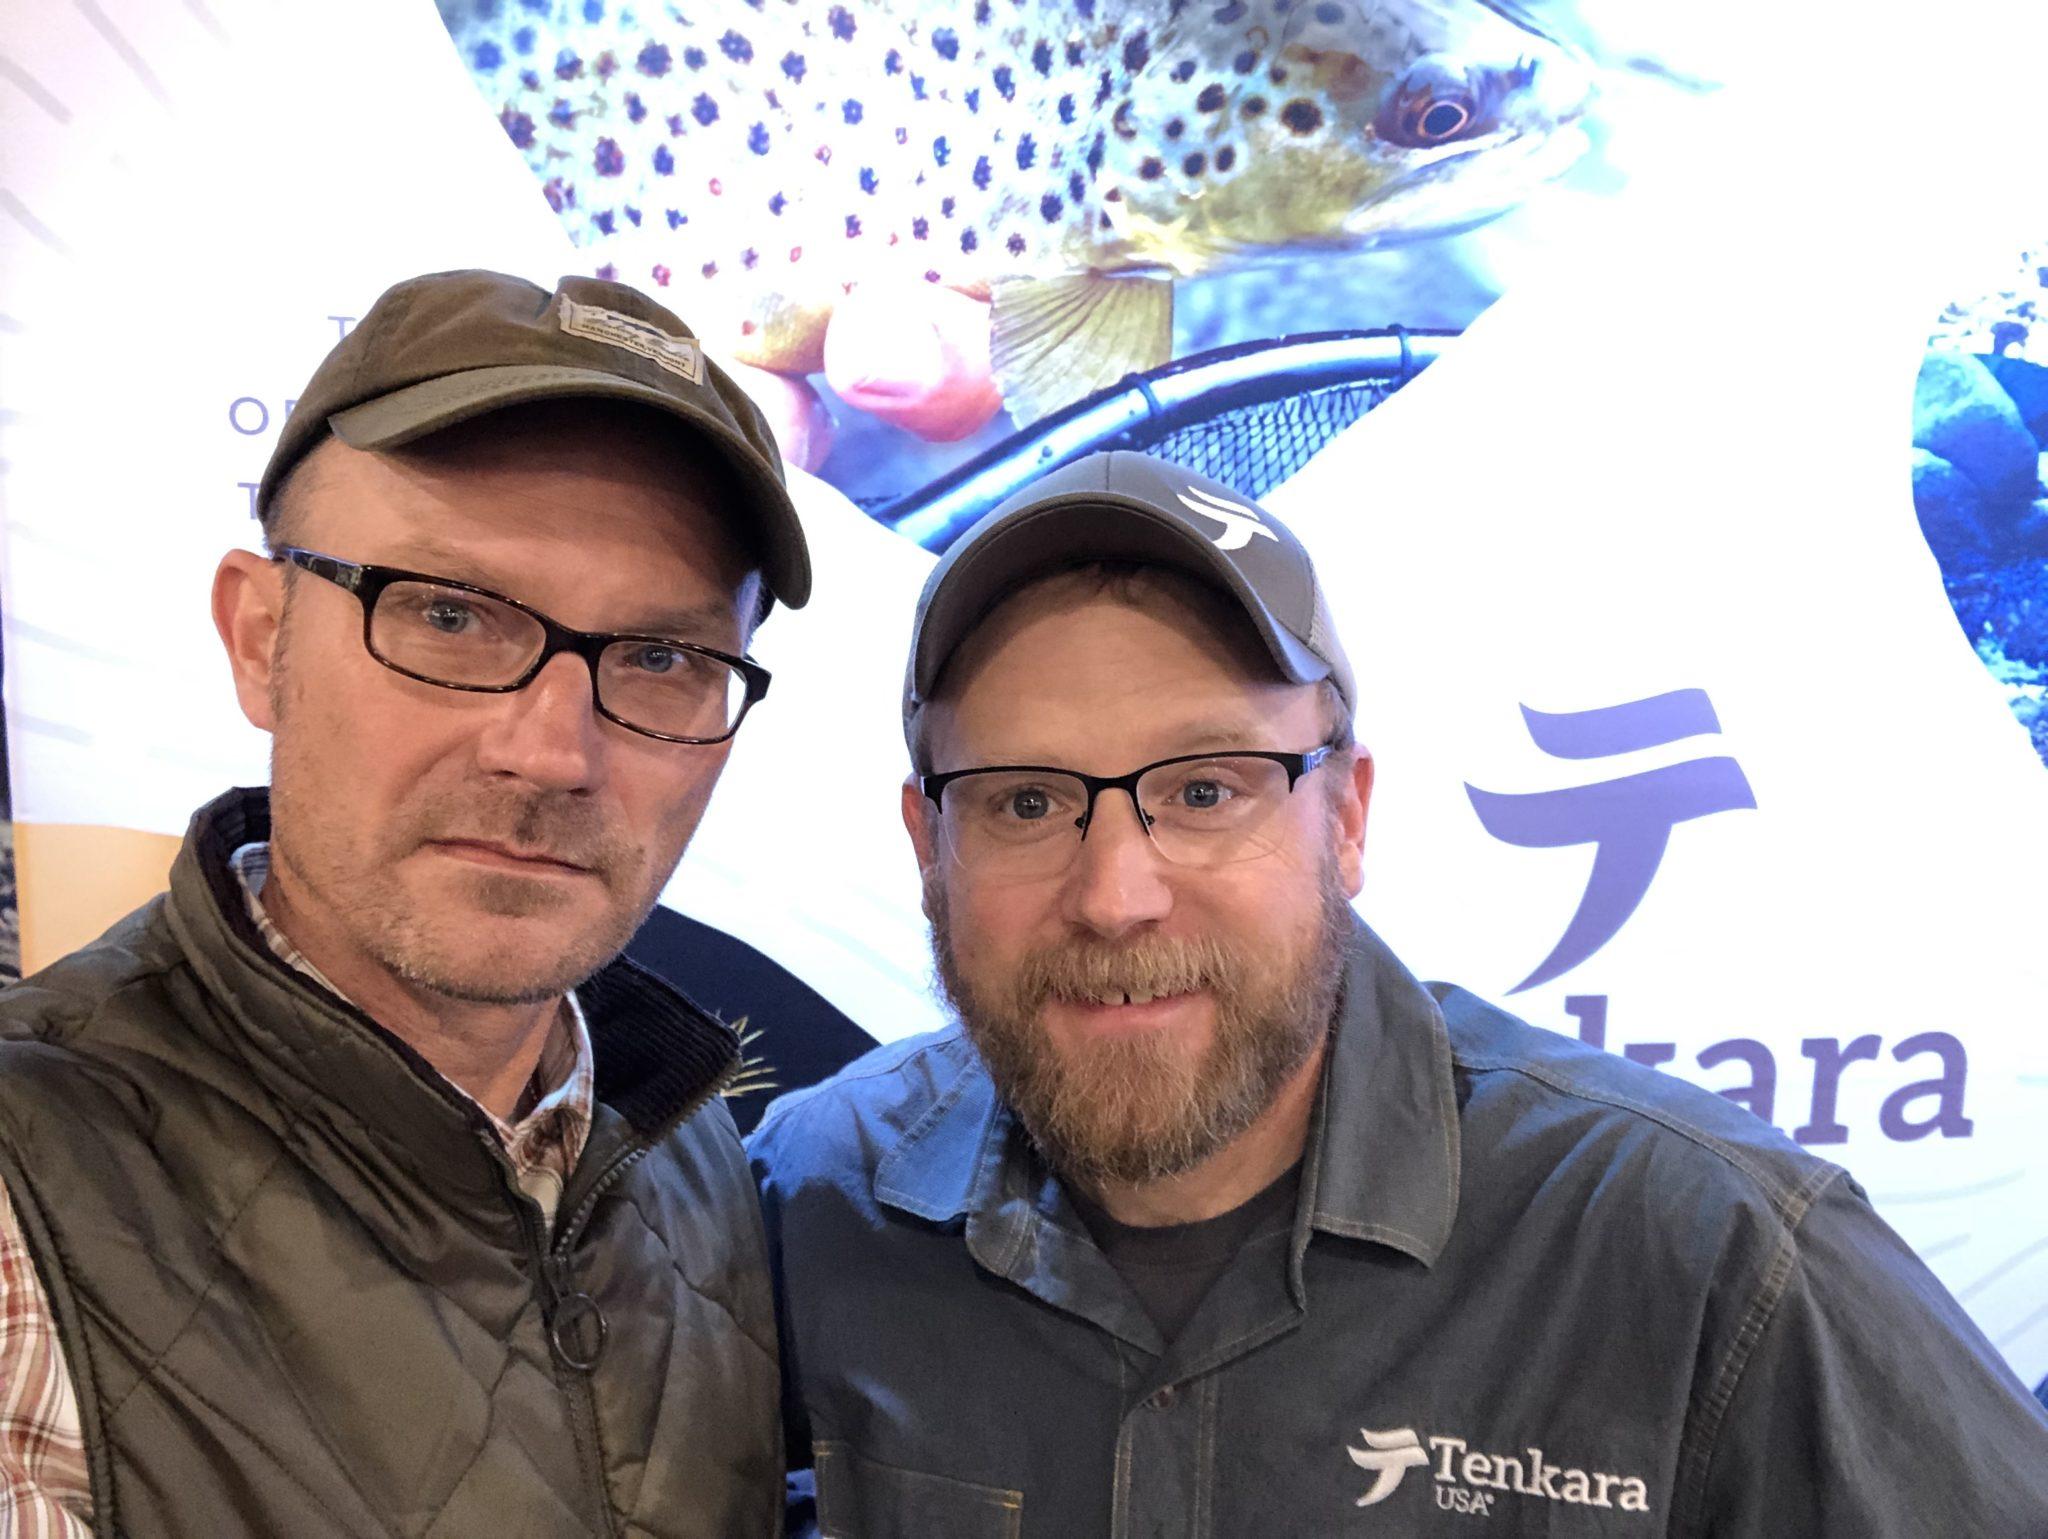 Jason Klass and John Geer